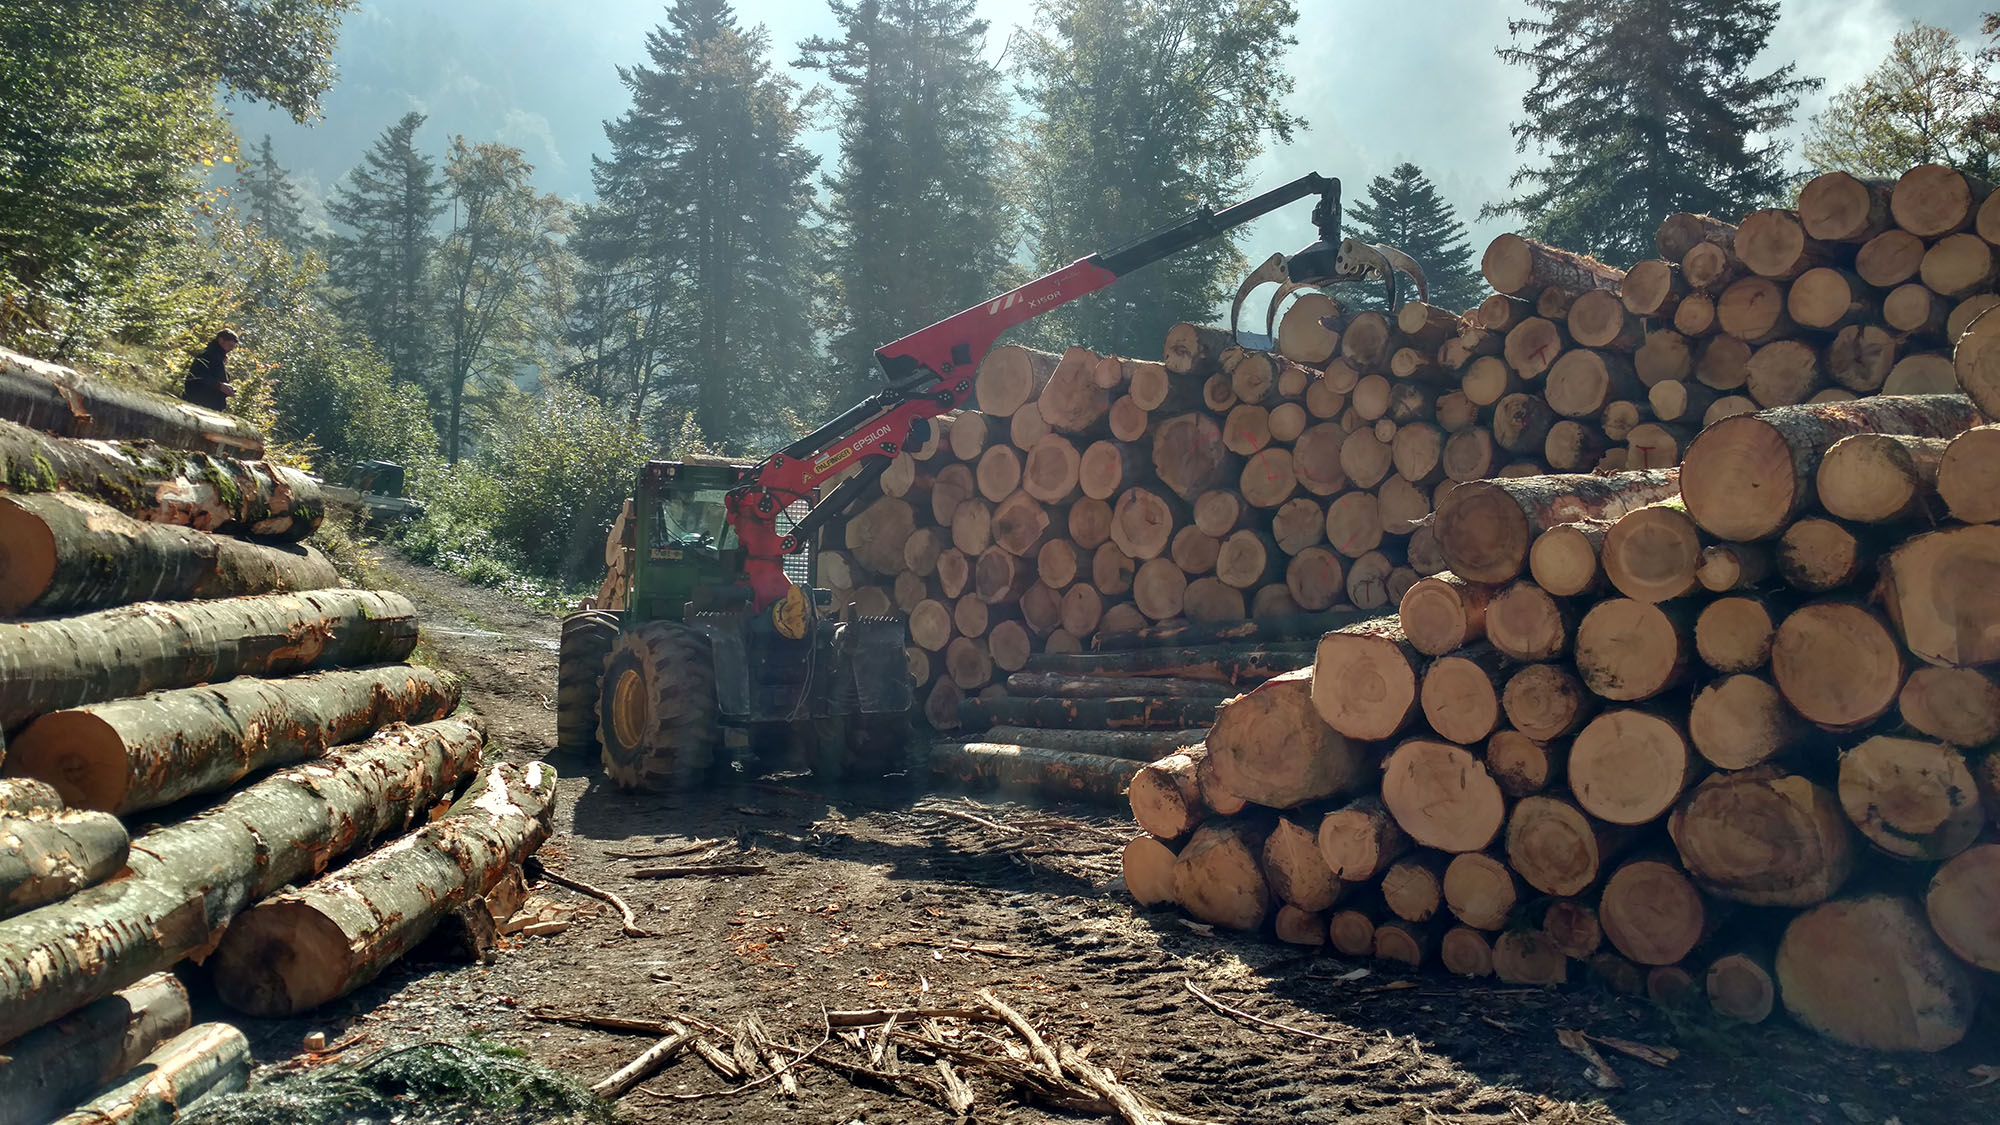 Maschinen Skidder Hochleitner AG Forstunternehmung